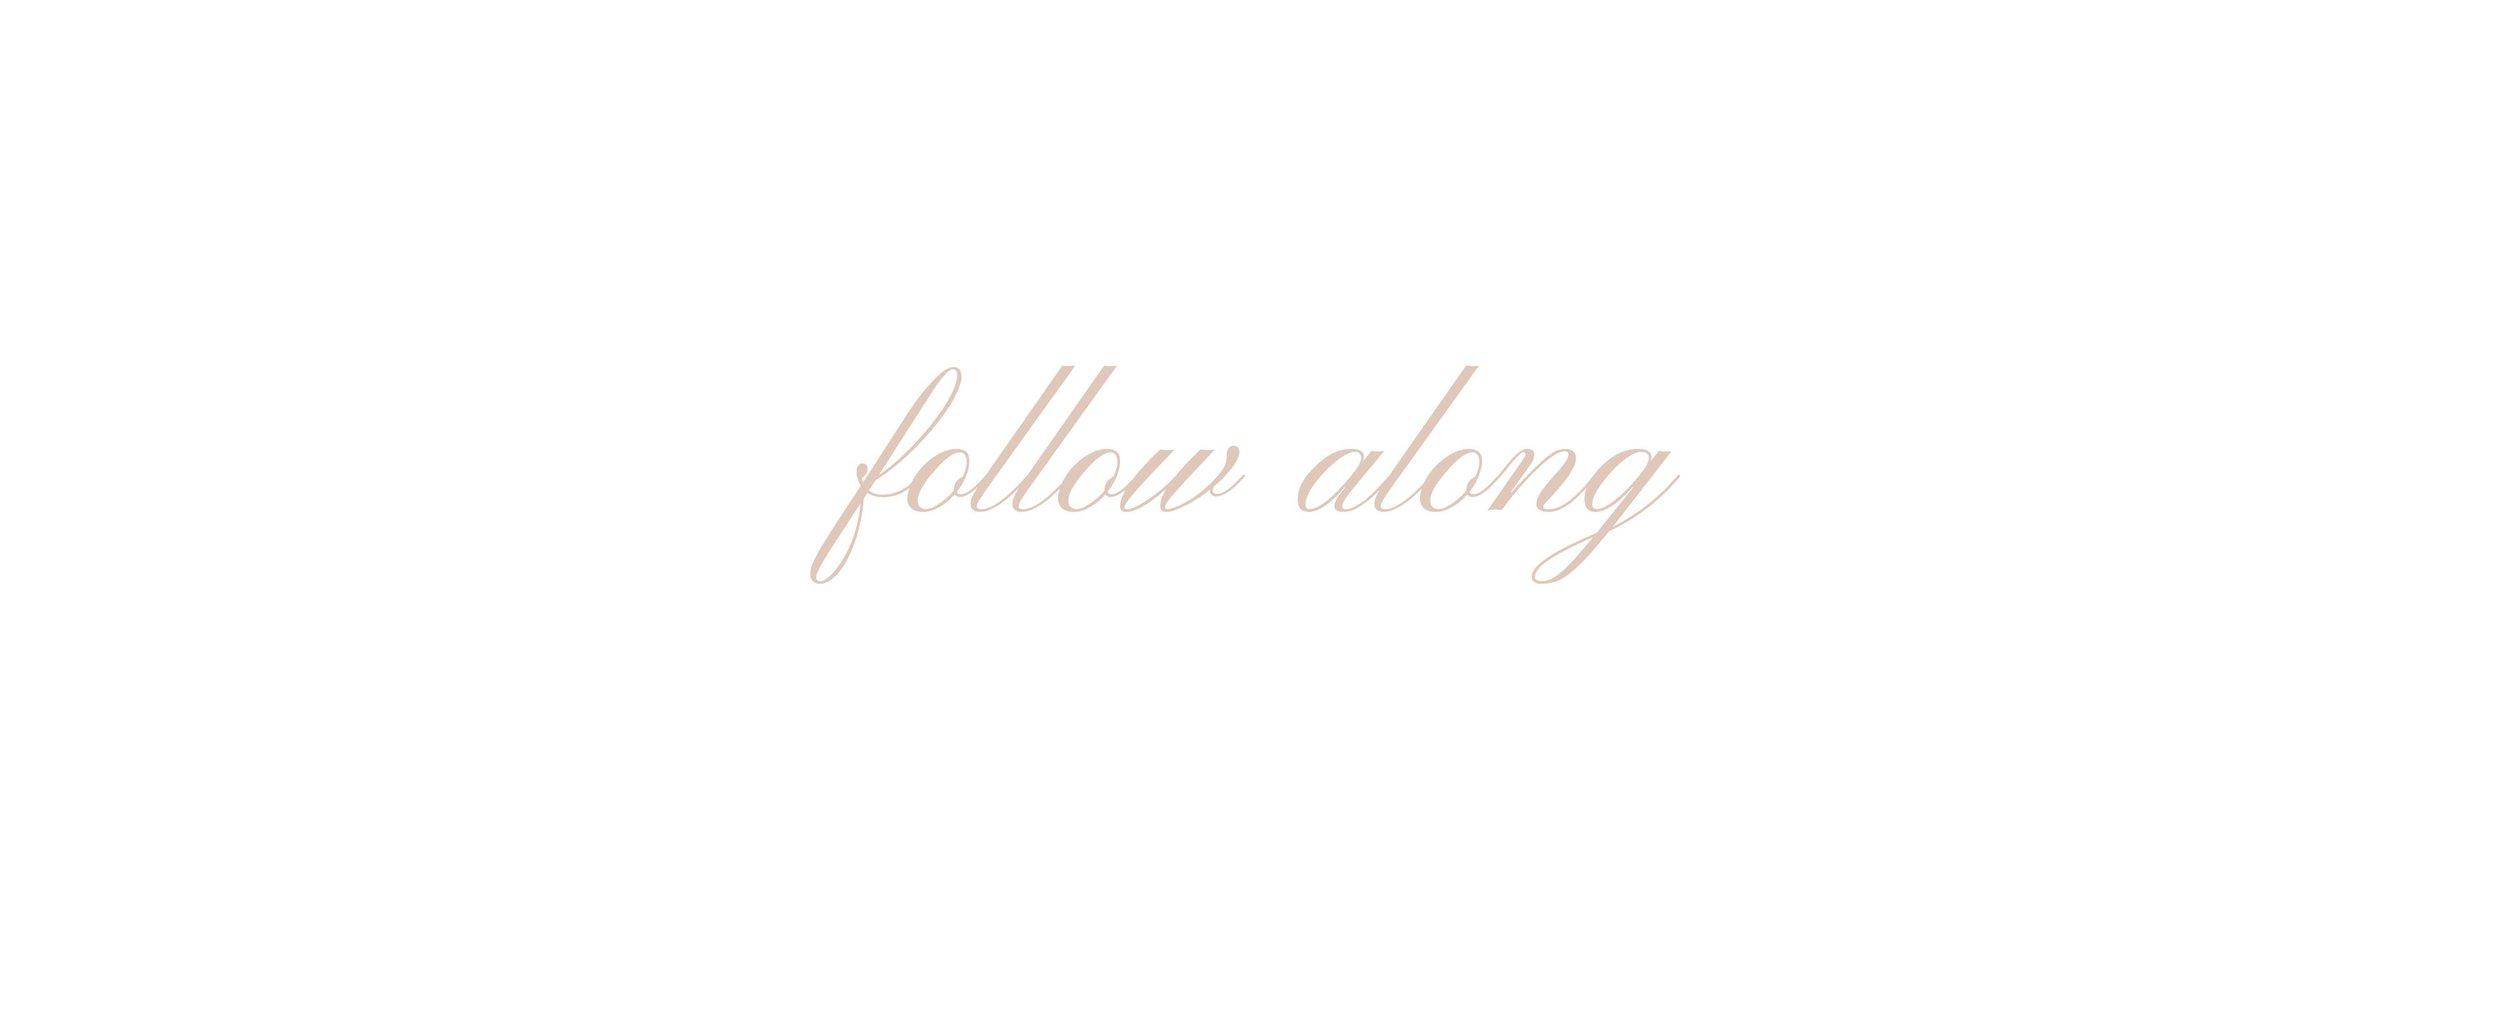 follow2.jpg